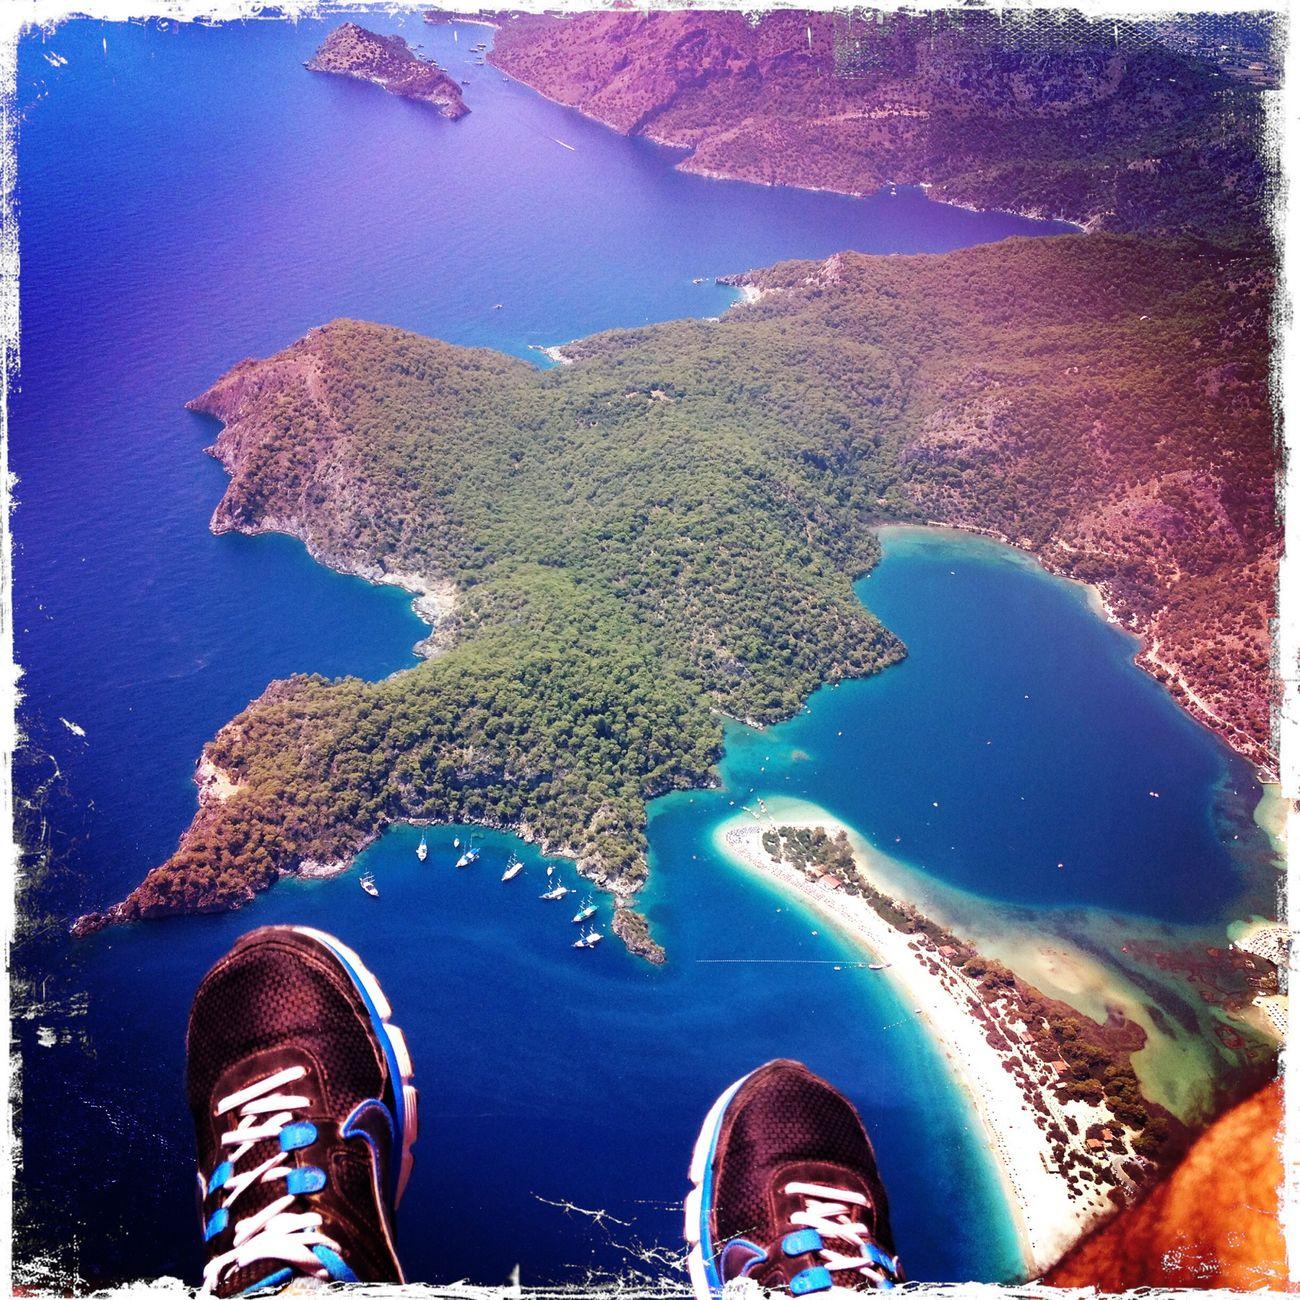 Paragliding Summer Freedom Flying